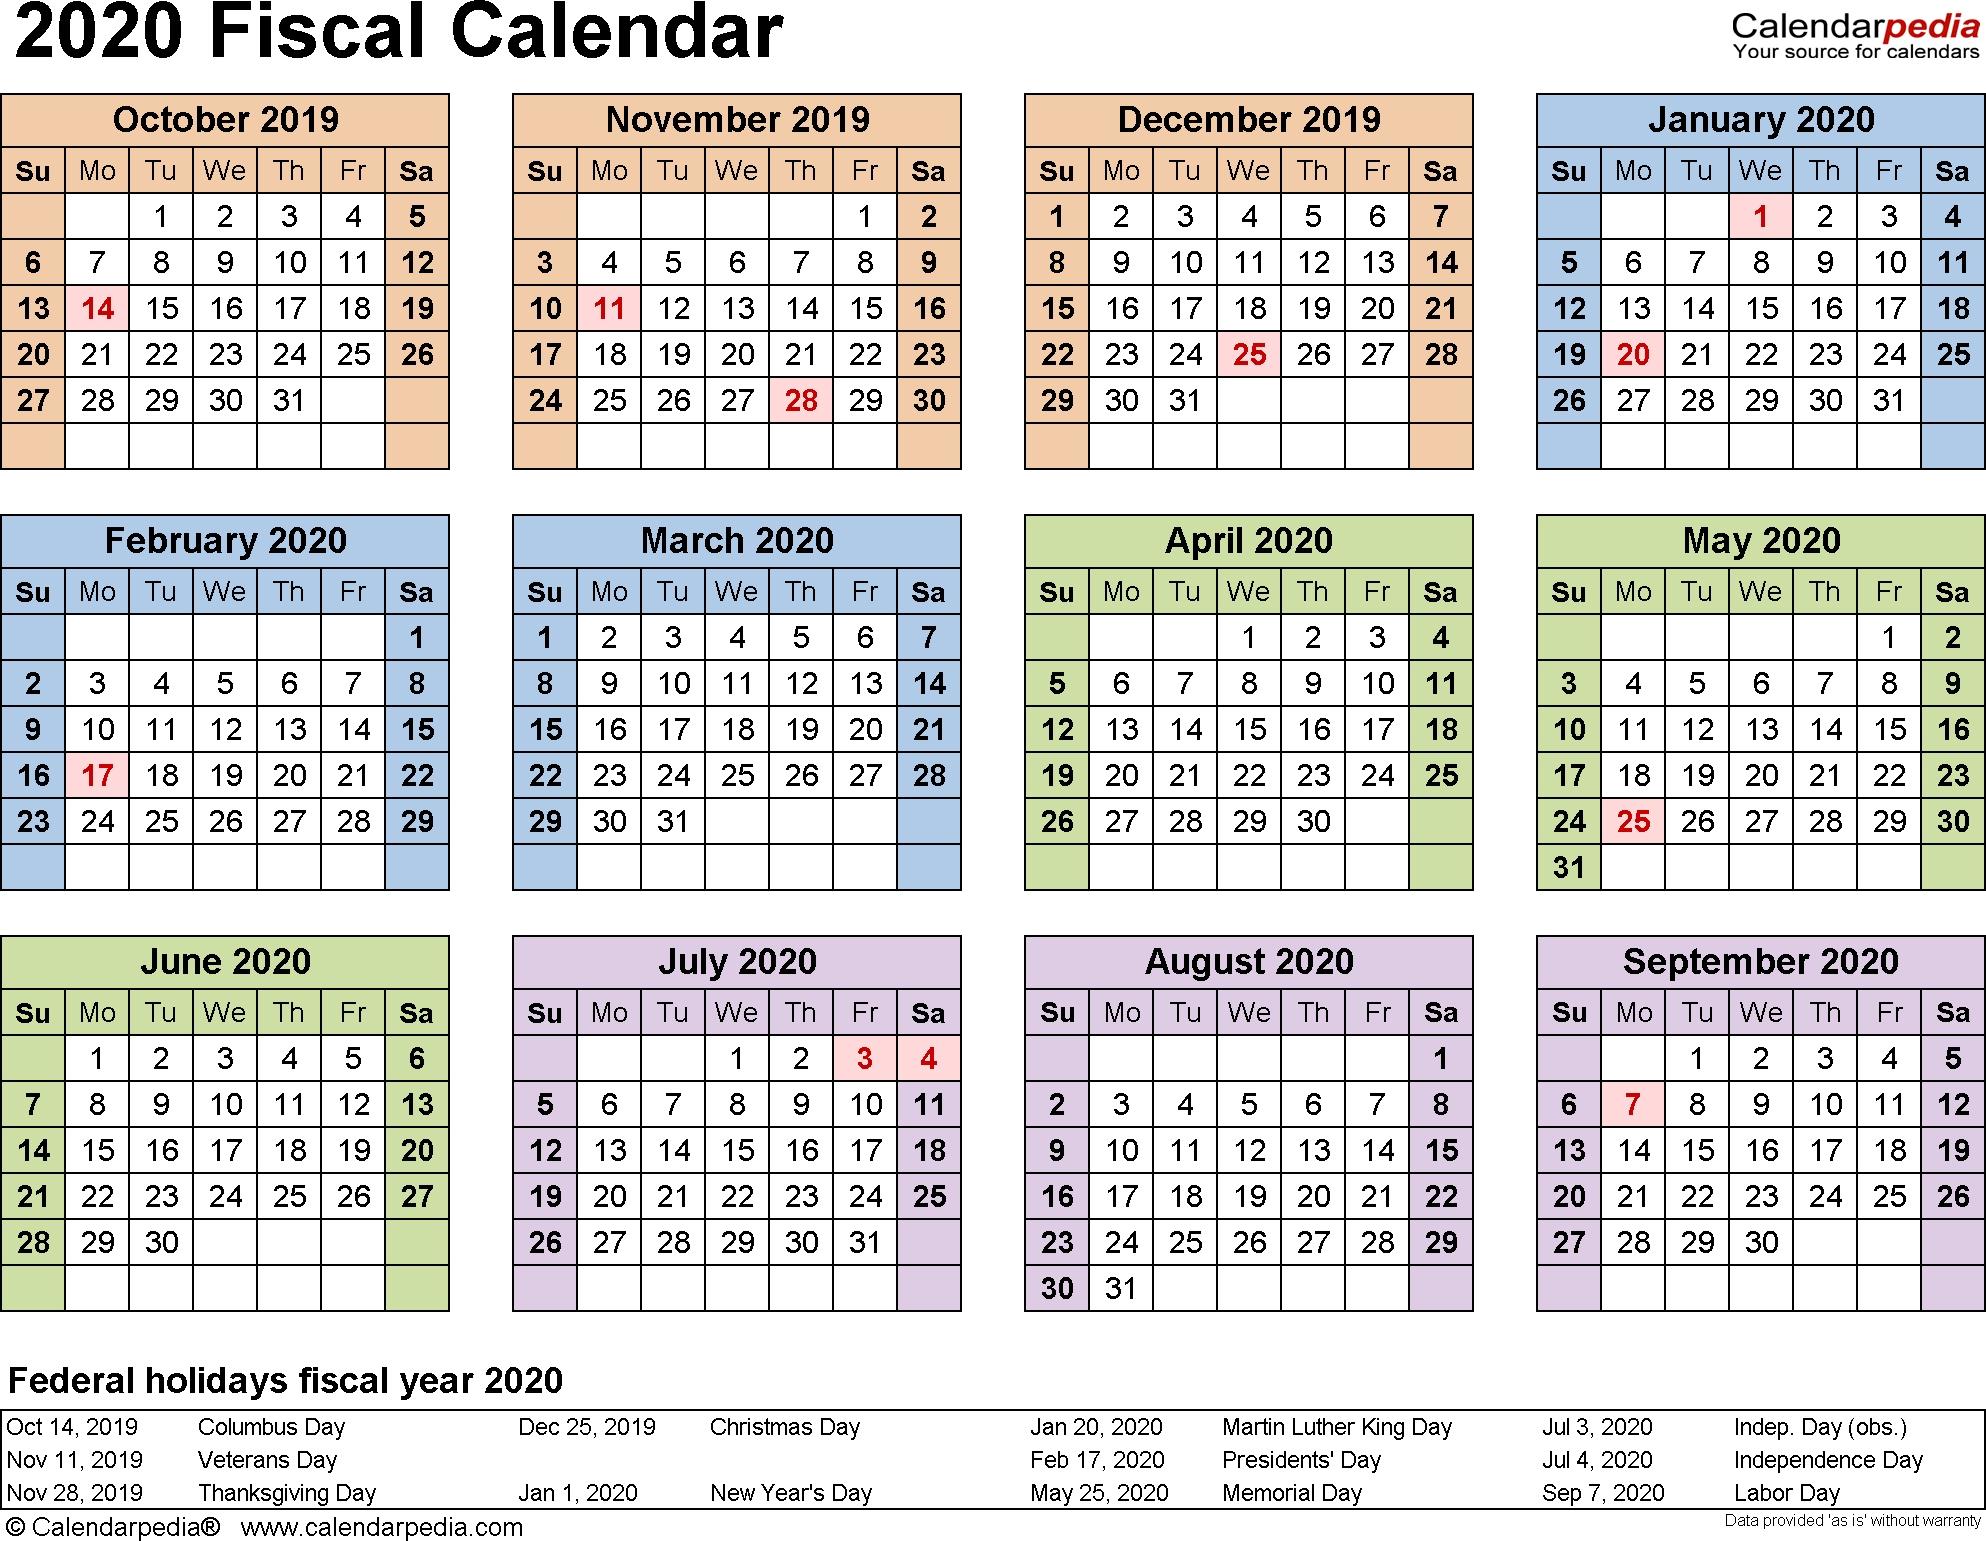 Fiscal Calendars 2020 As Free Printable Pdf Templates  Financial Year Dates 2020 2020  Australia